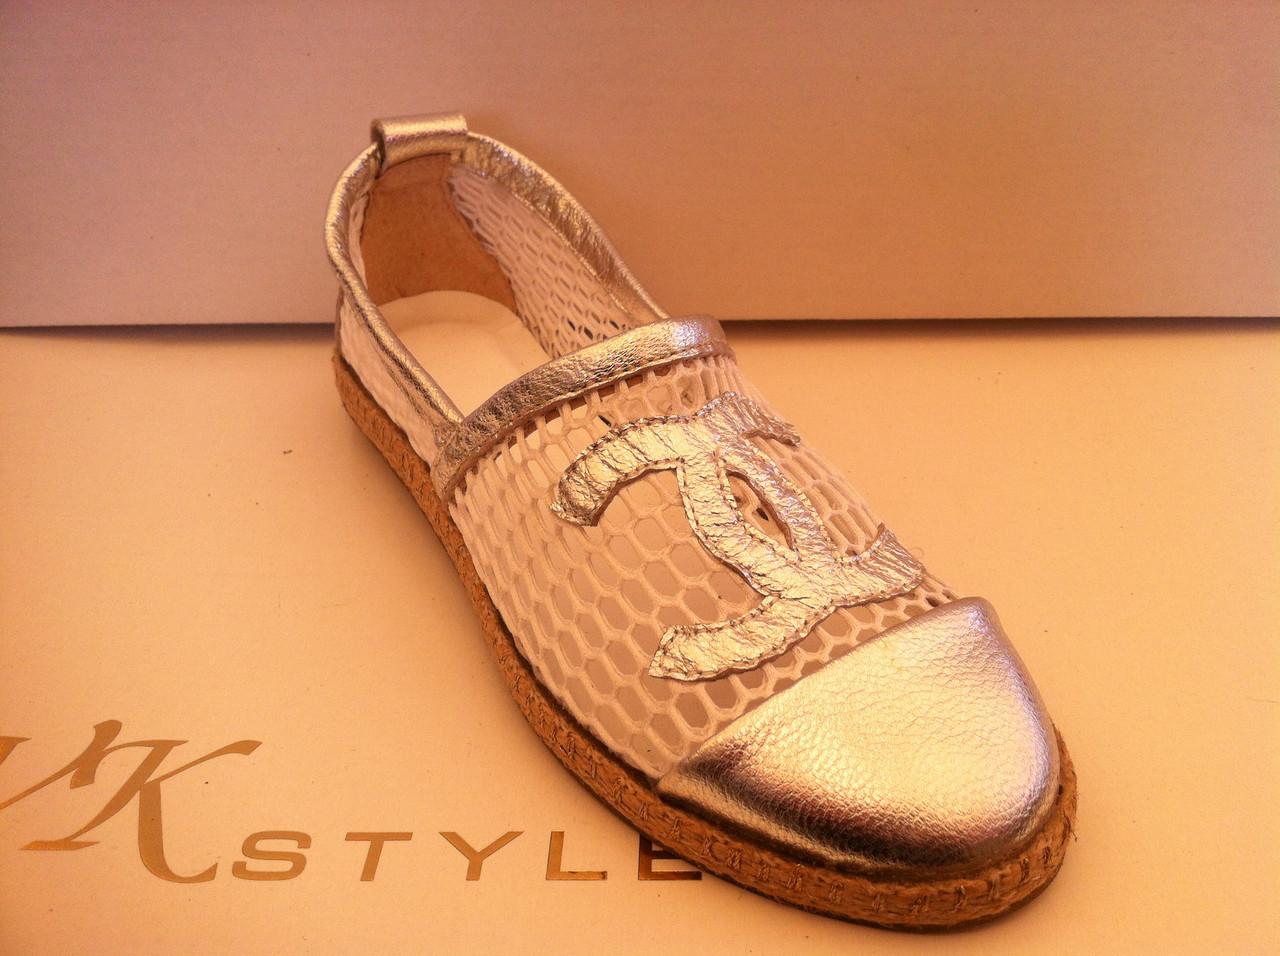 e5e50fc3d5a8 Женские эспадрильи Chanel серебро и золото.  продажа, цена в ...